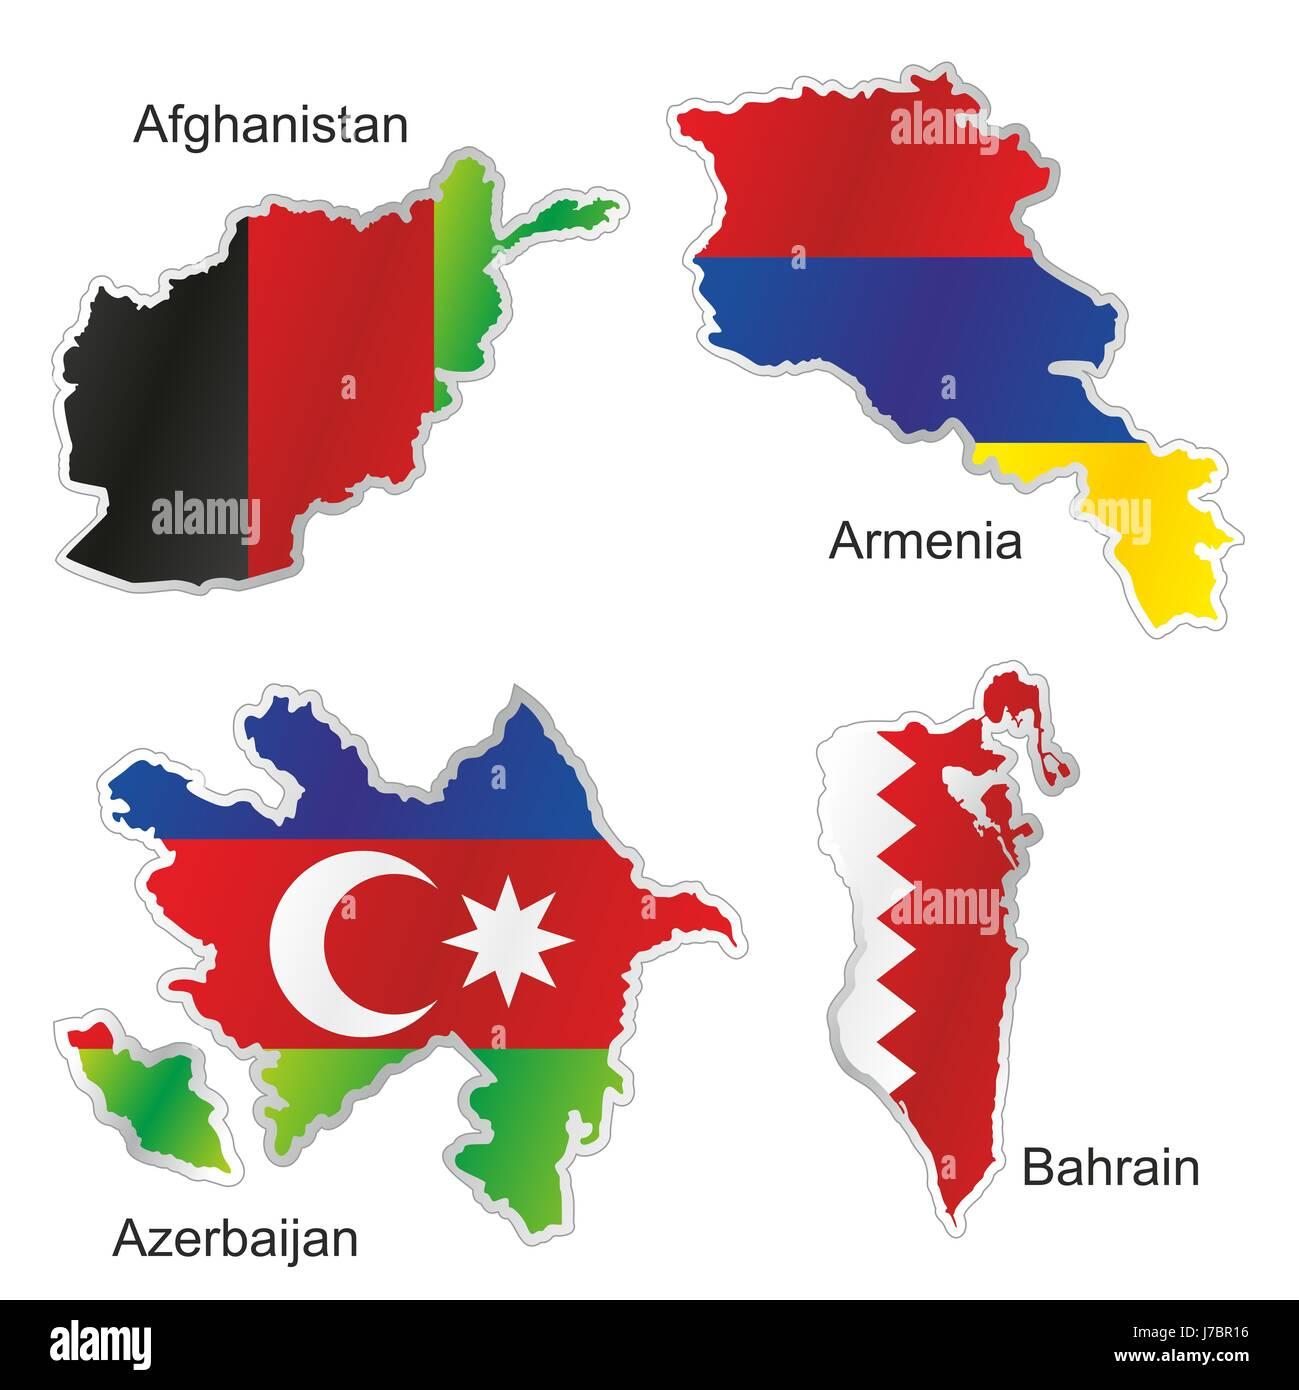 Asien Flagge Aserbaidschan Armenien Afghanistan Karte Atlas Weltkarte Isoliert Stockfotografie Alamy